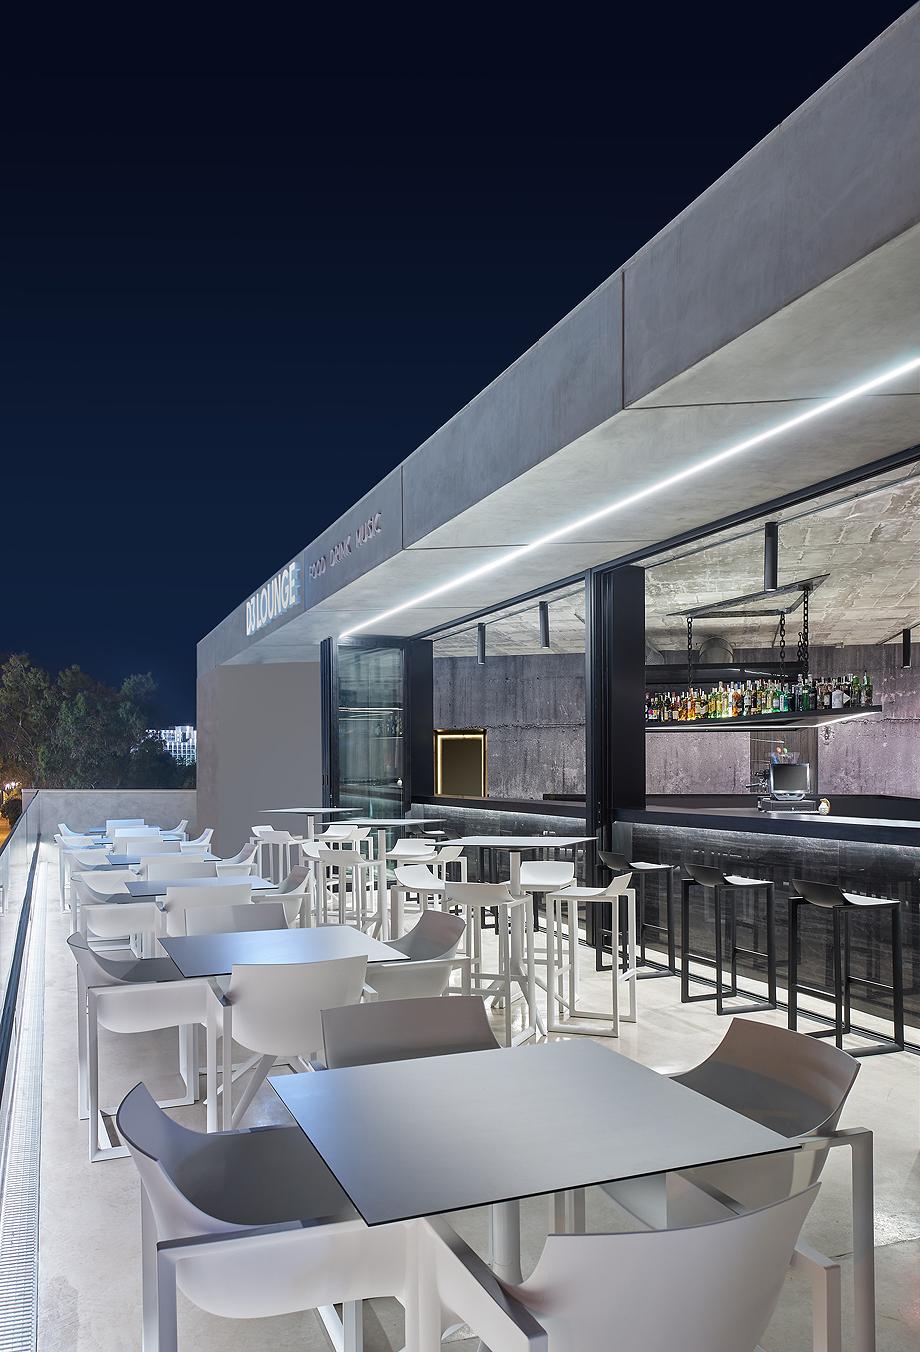 D3 Disco by Minimal Studio. Architect: J.David Martinez Jofre